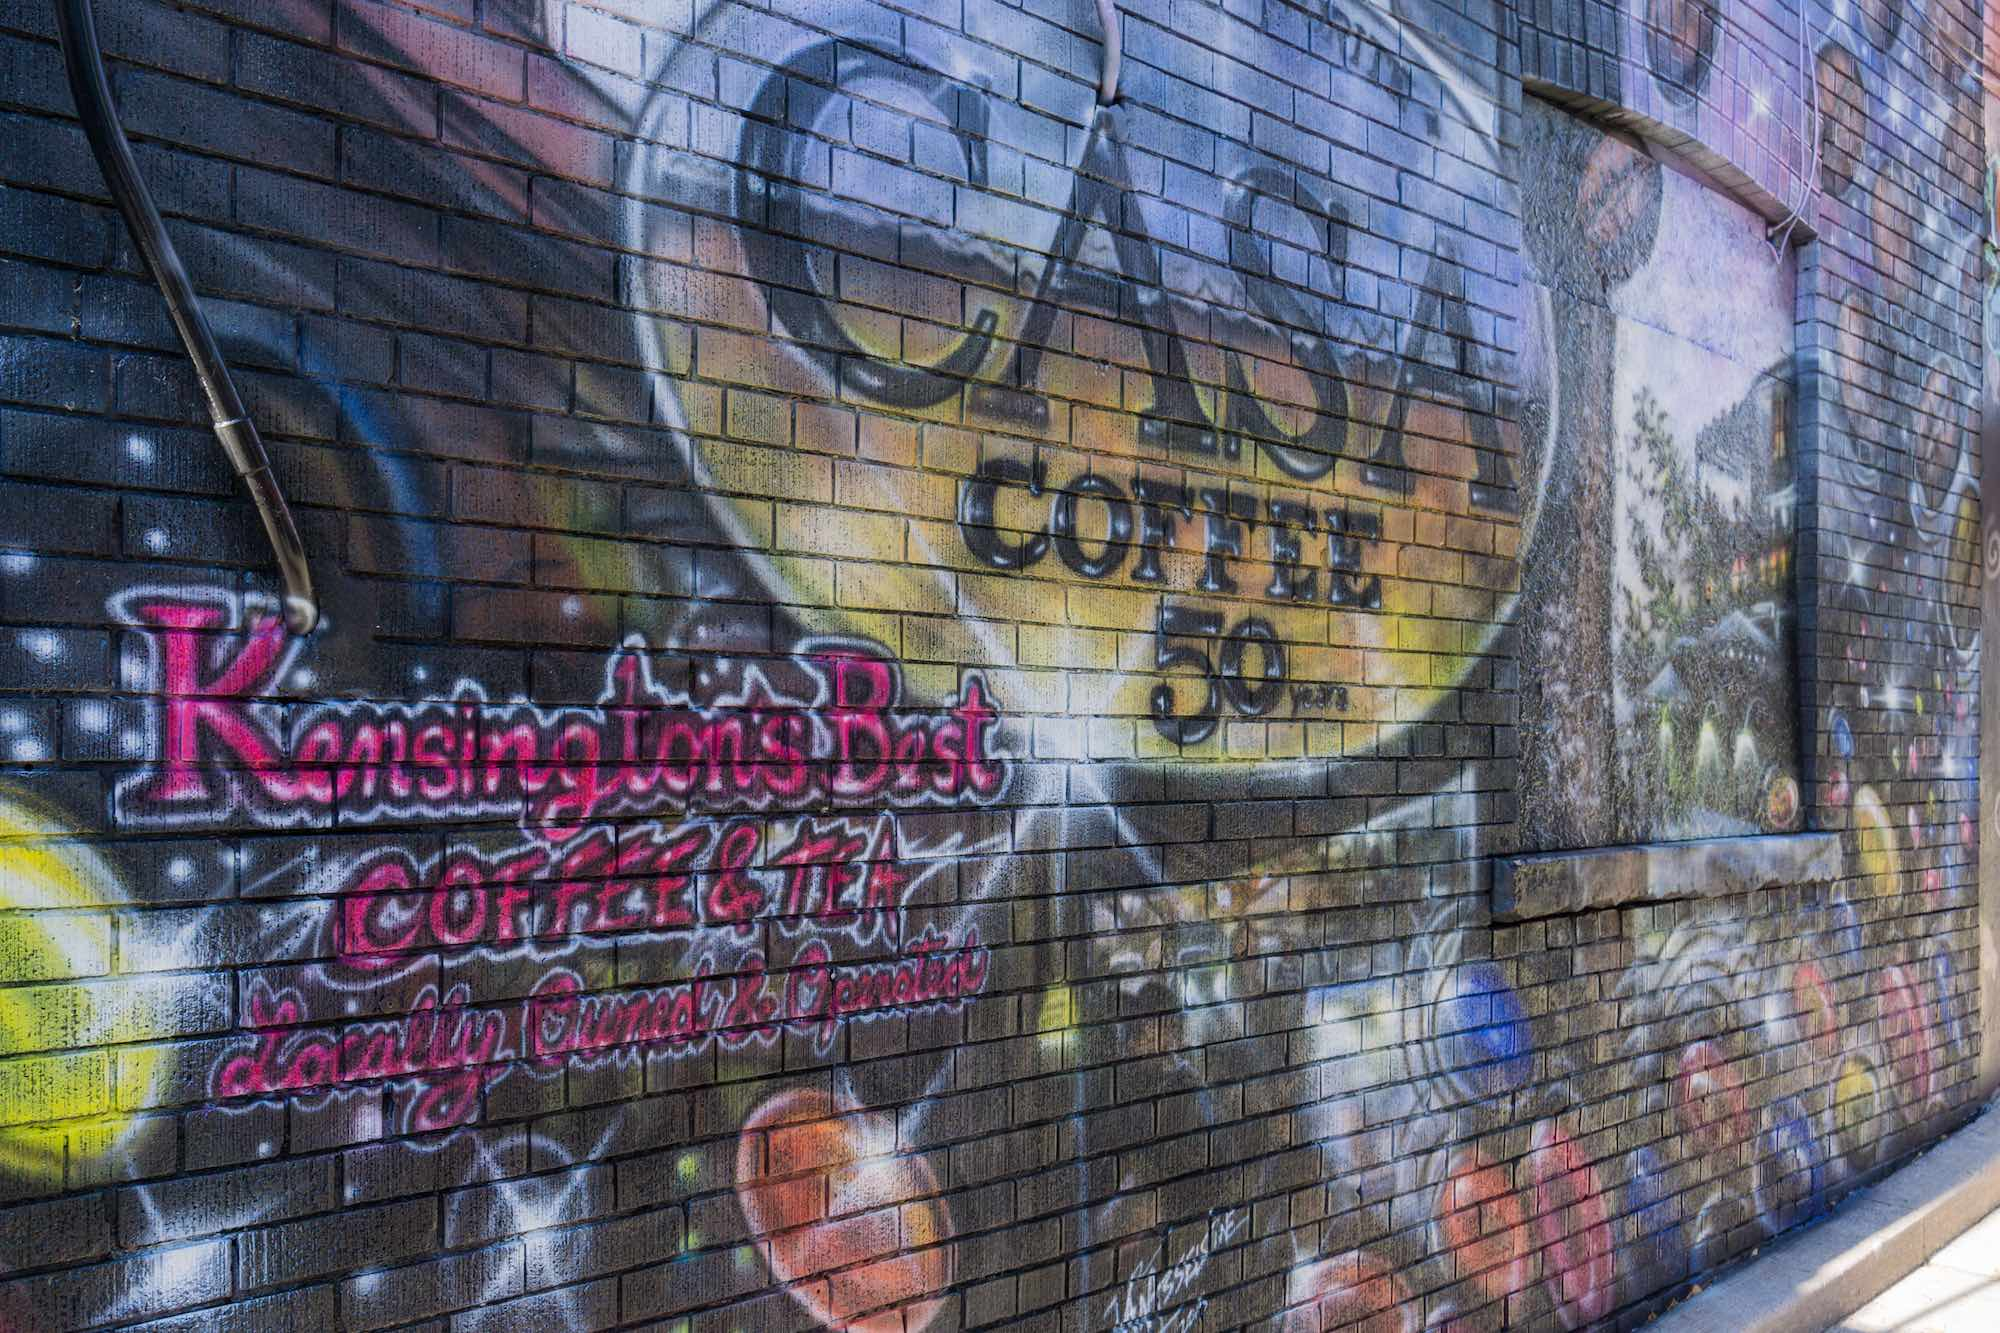 Graffiti wall toronto downtown - Graffiti In The Service Of Commerce